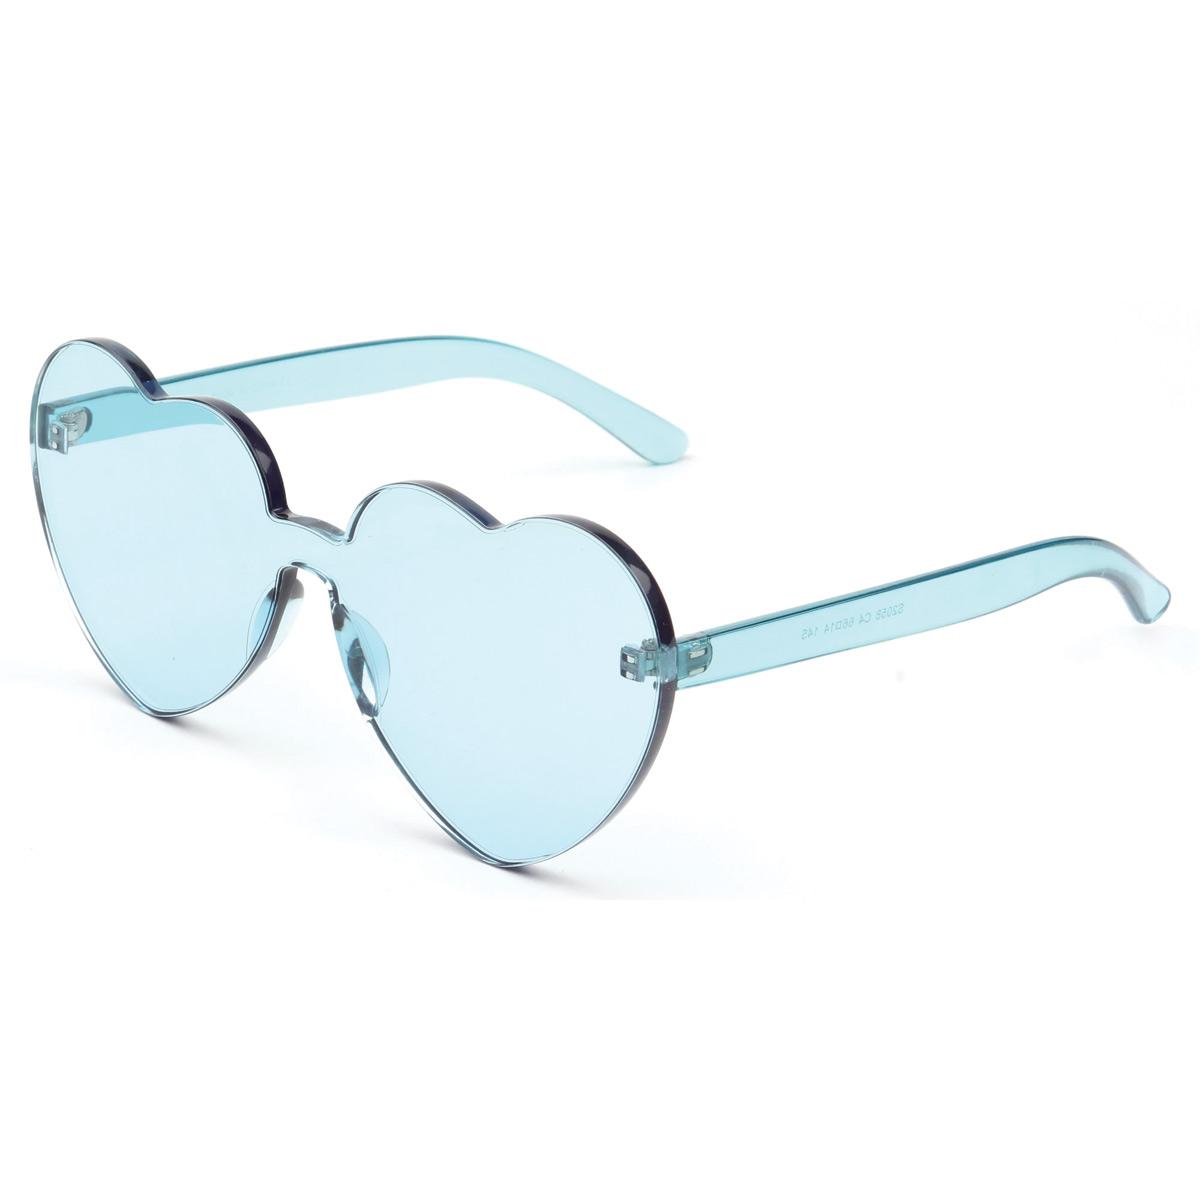 Light Blue Rimless Heart Sunglasses